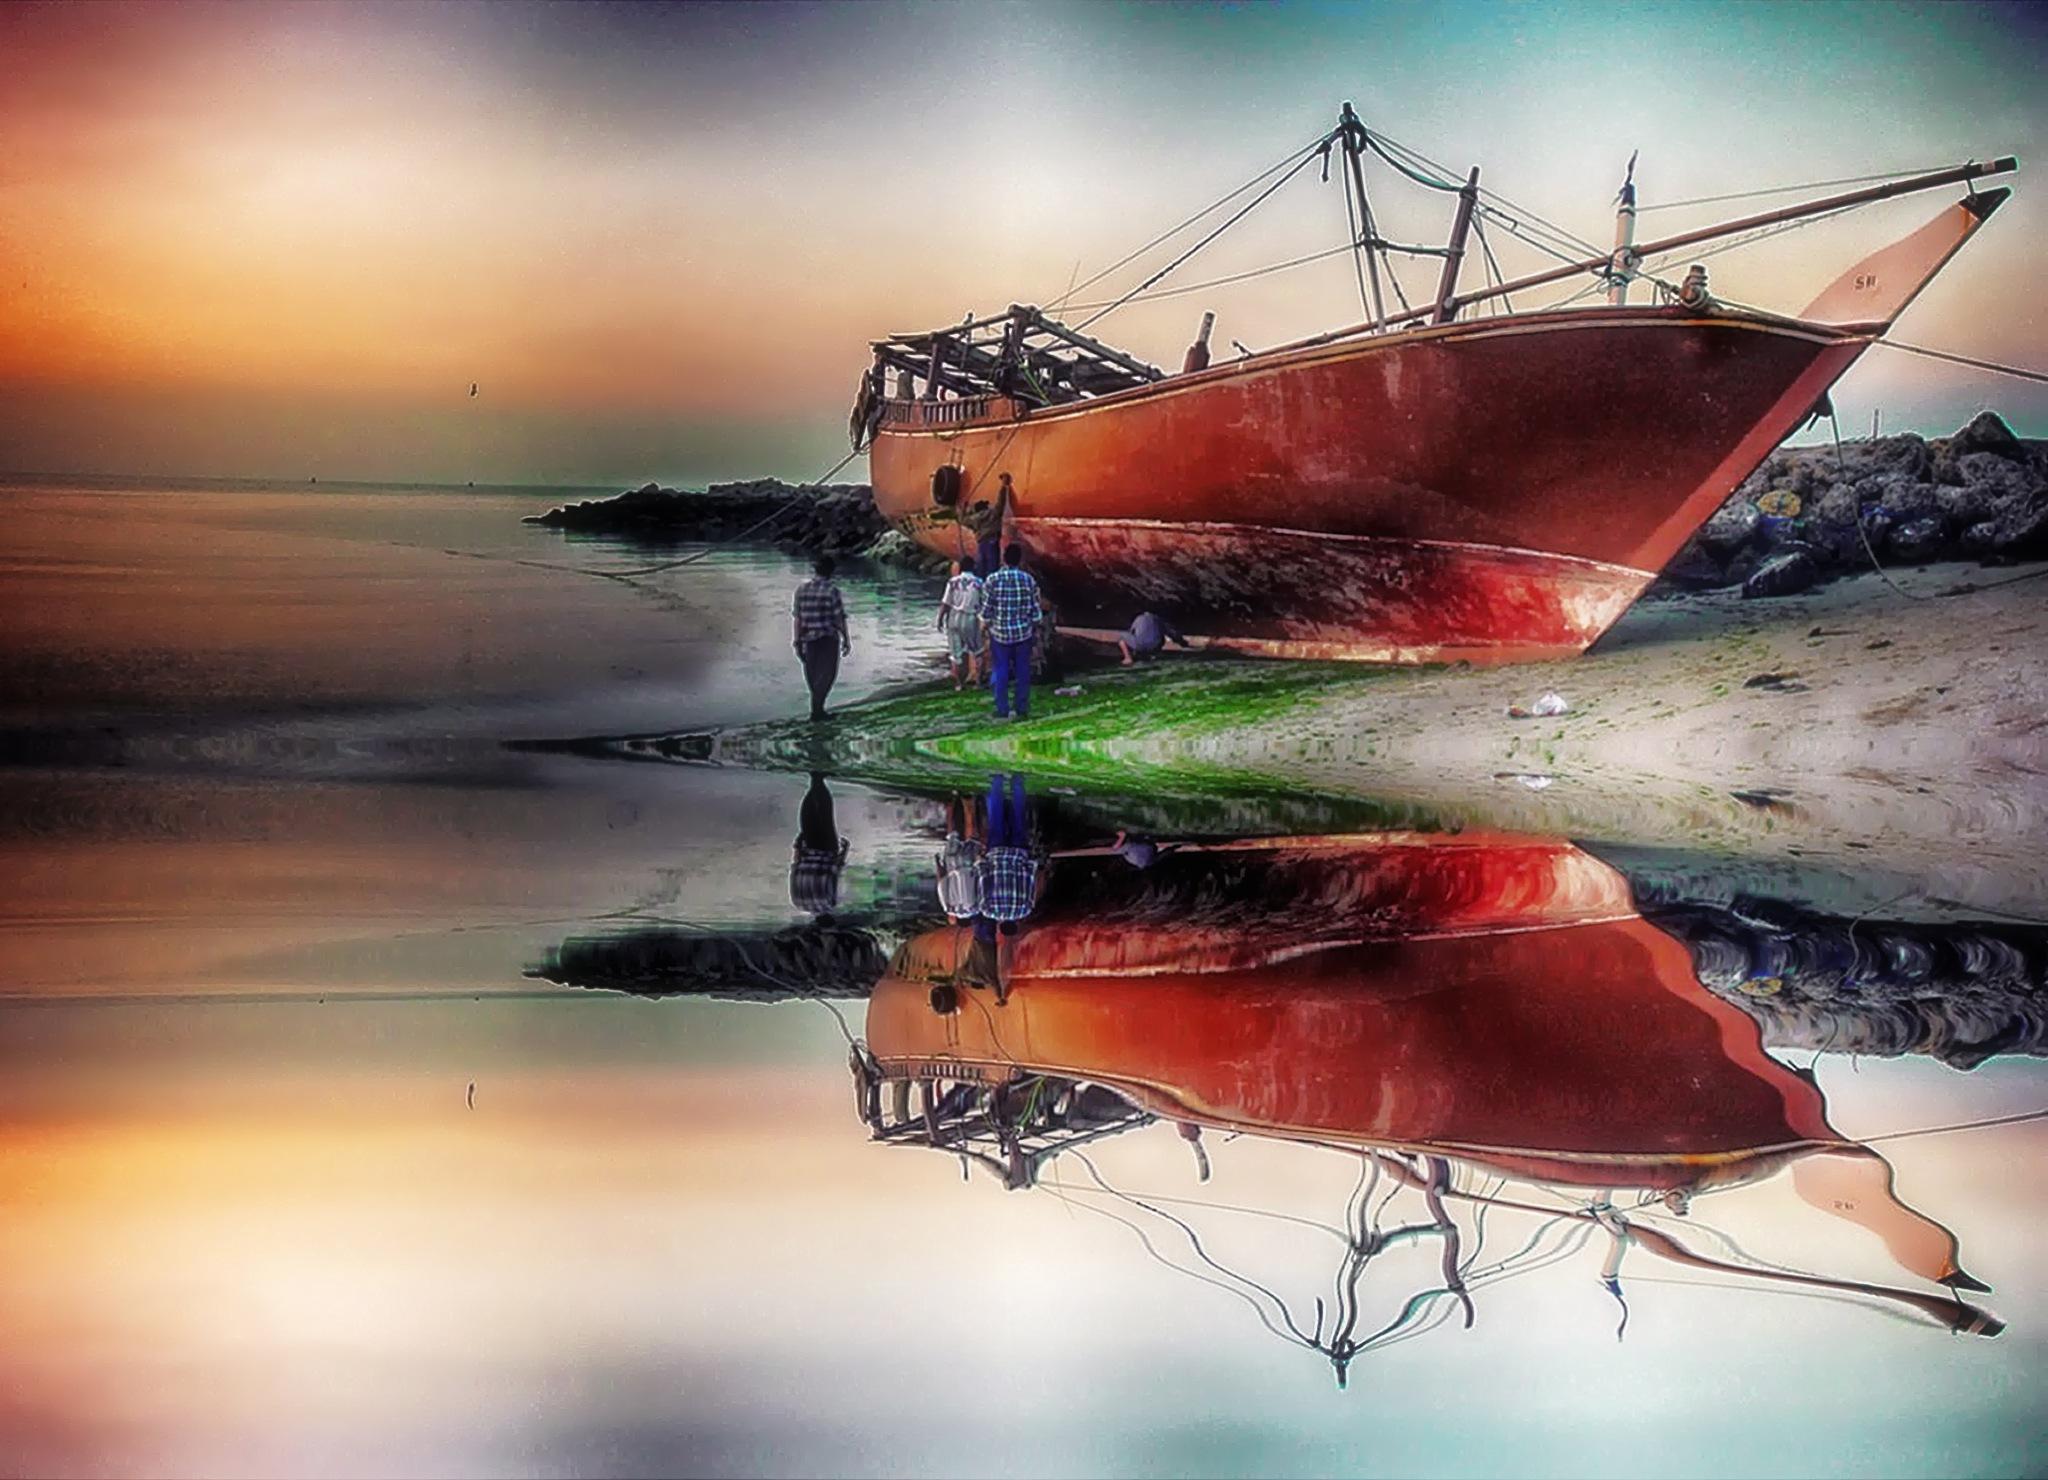 Untitled by Hisham Badran